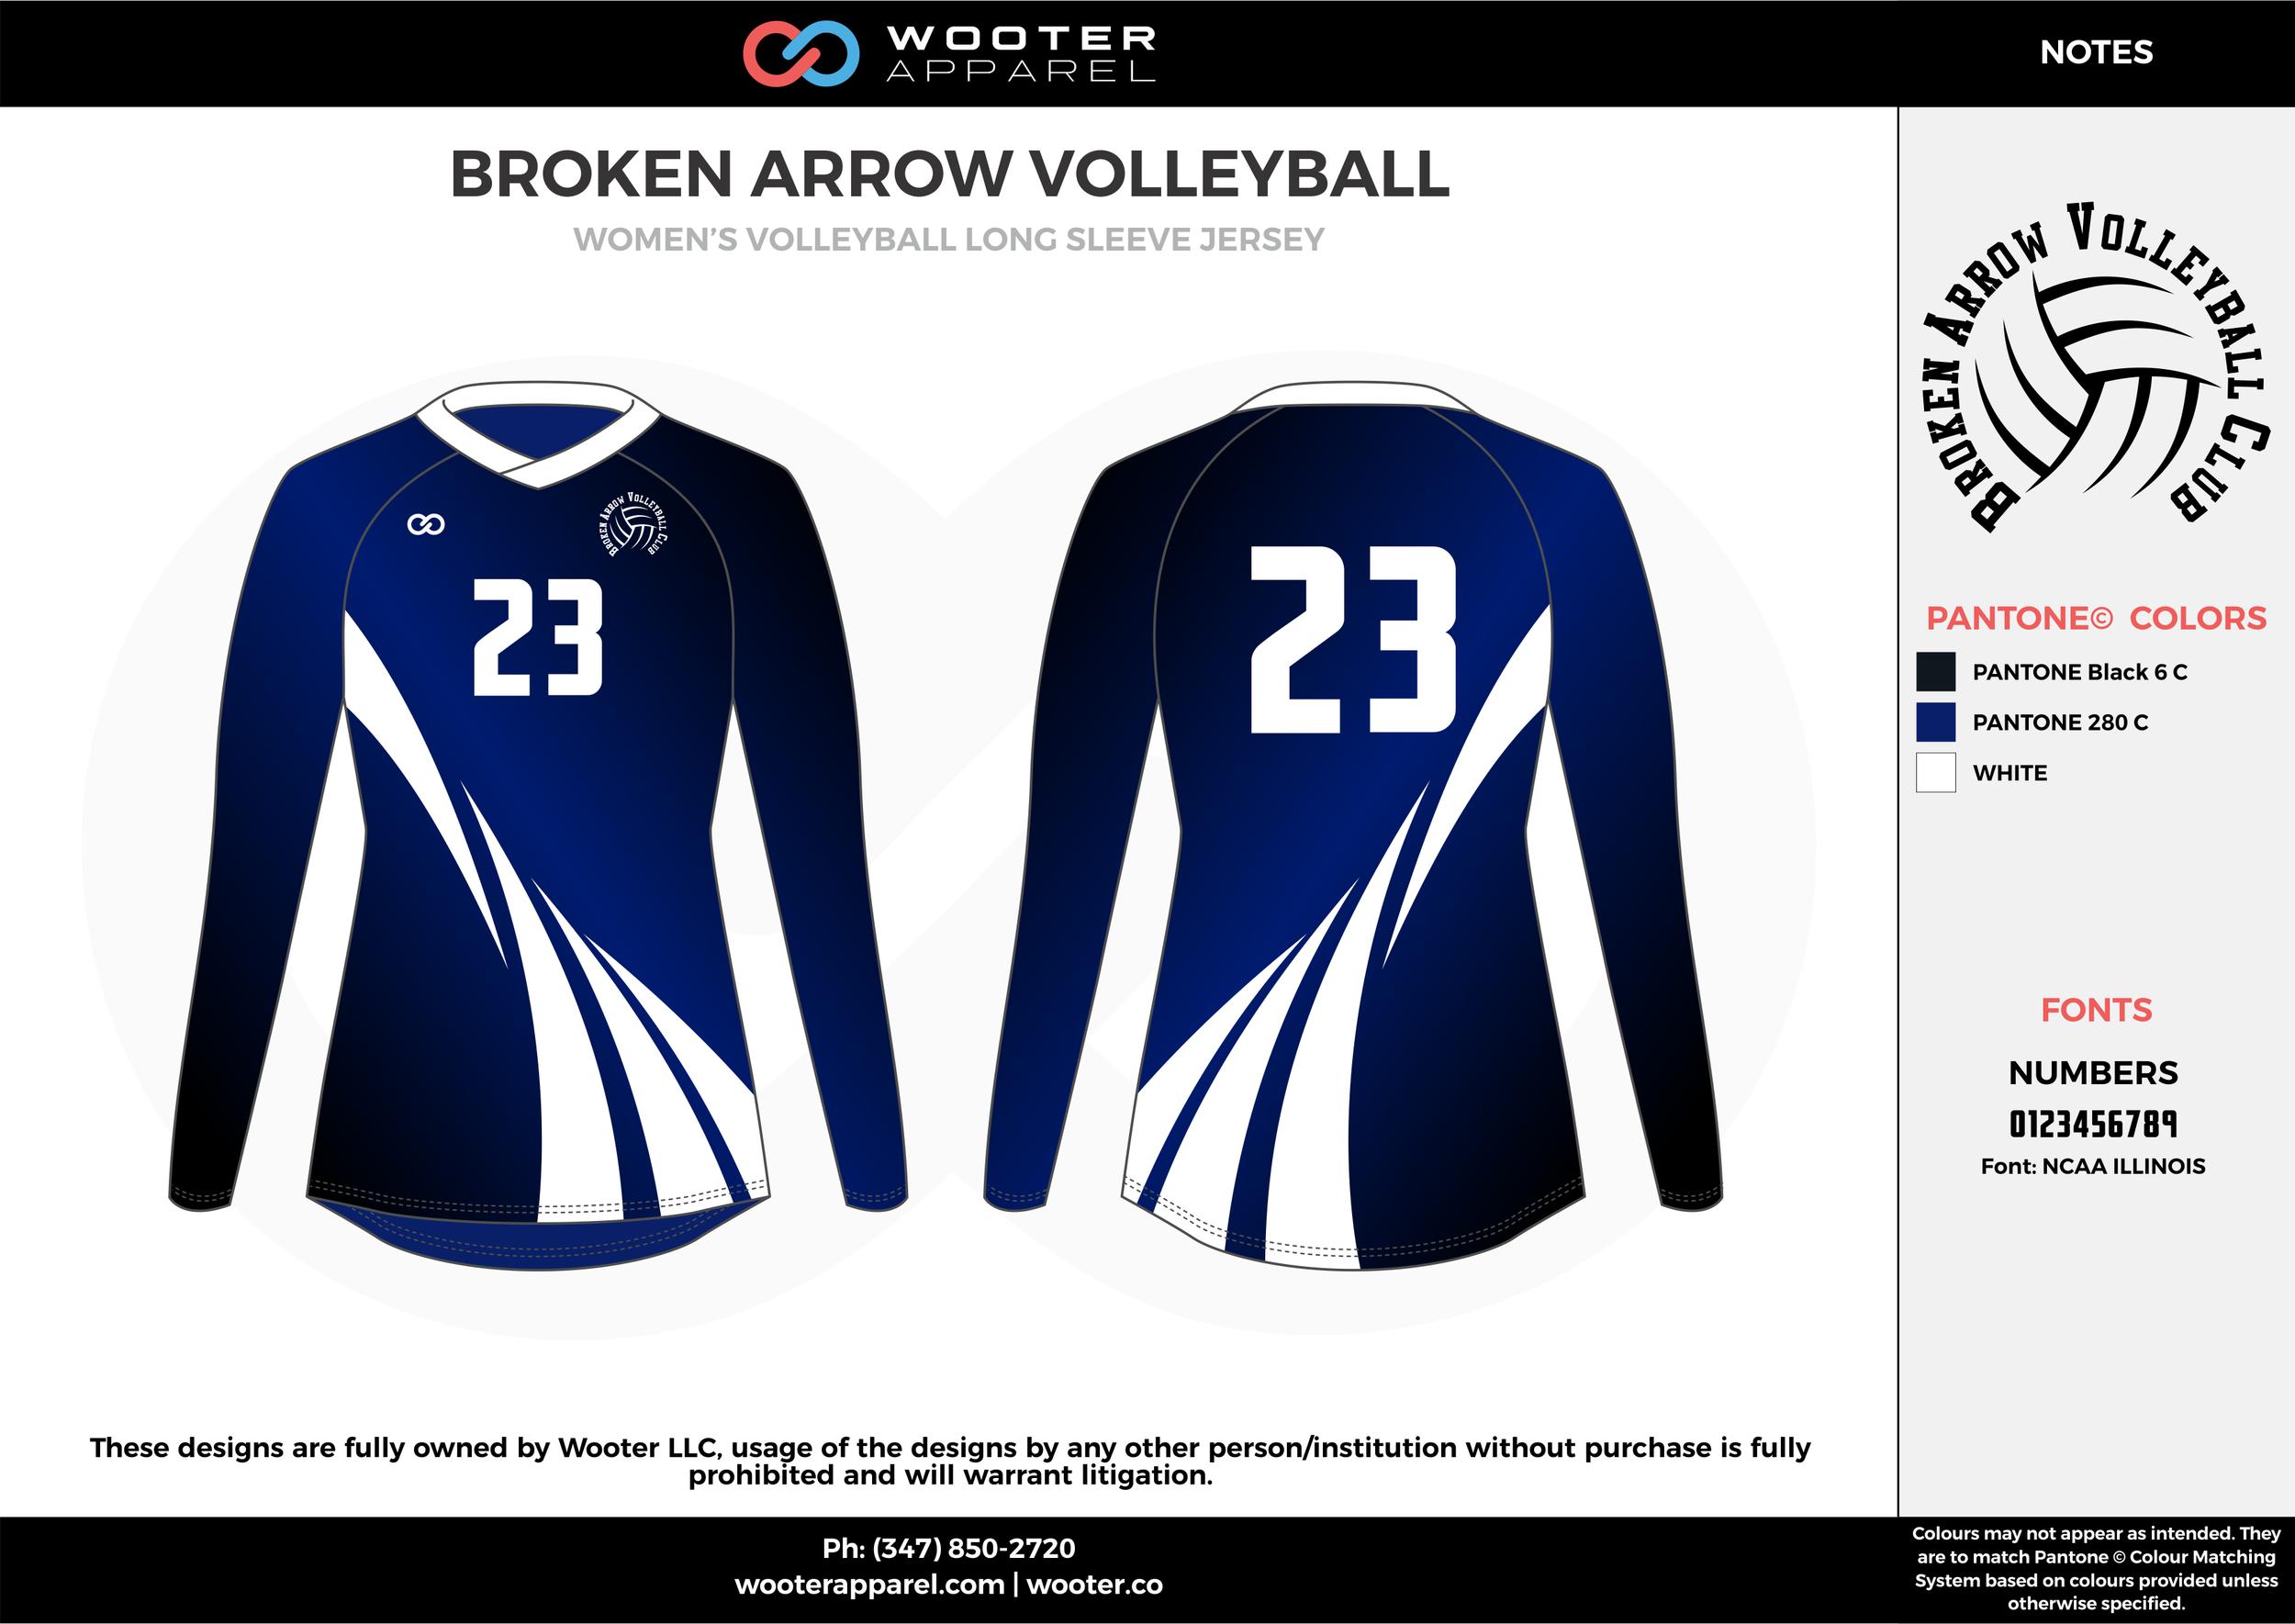 BROKEN ARROW VOLLEYBALL black blue white Volleyball Uniforms, Long Sleeve Jerseys, Shorts